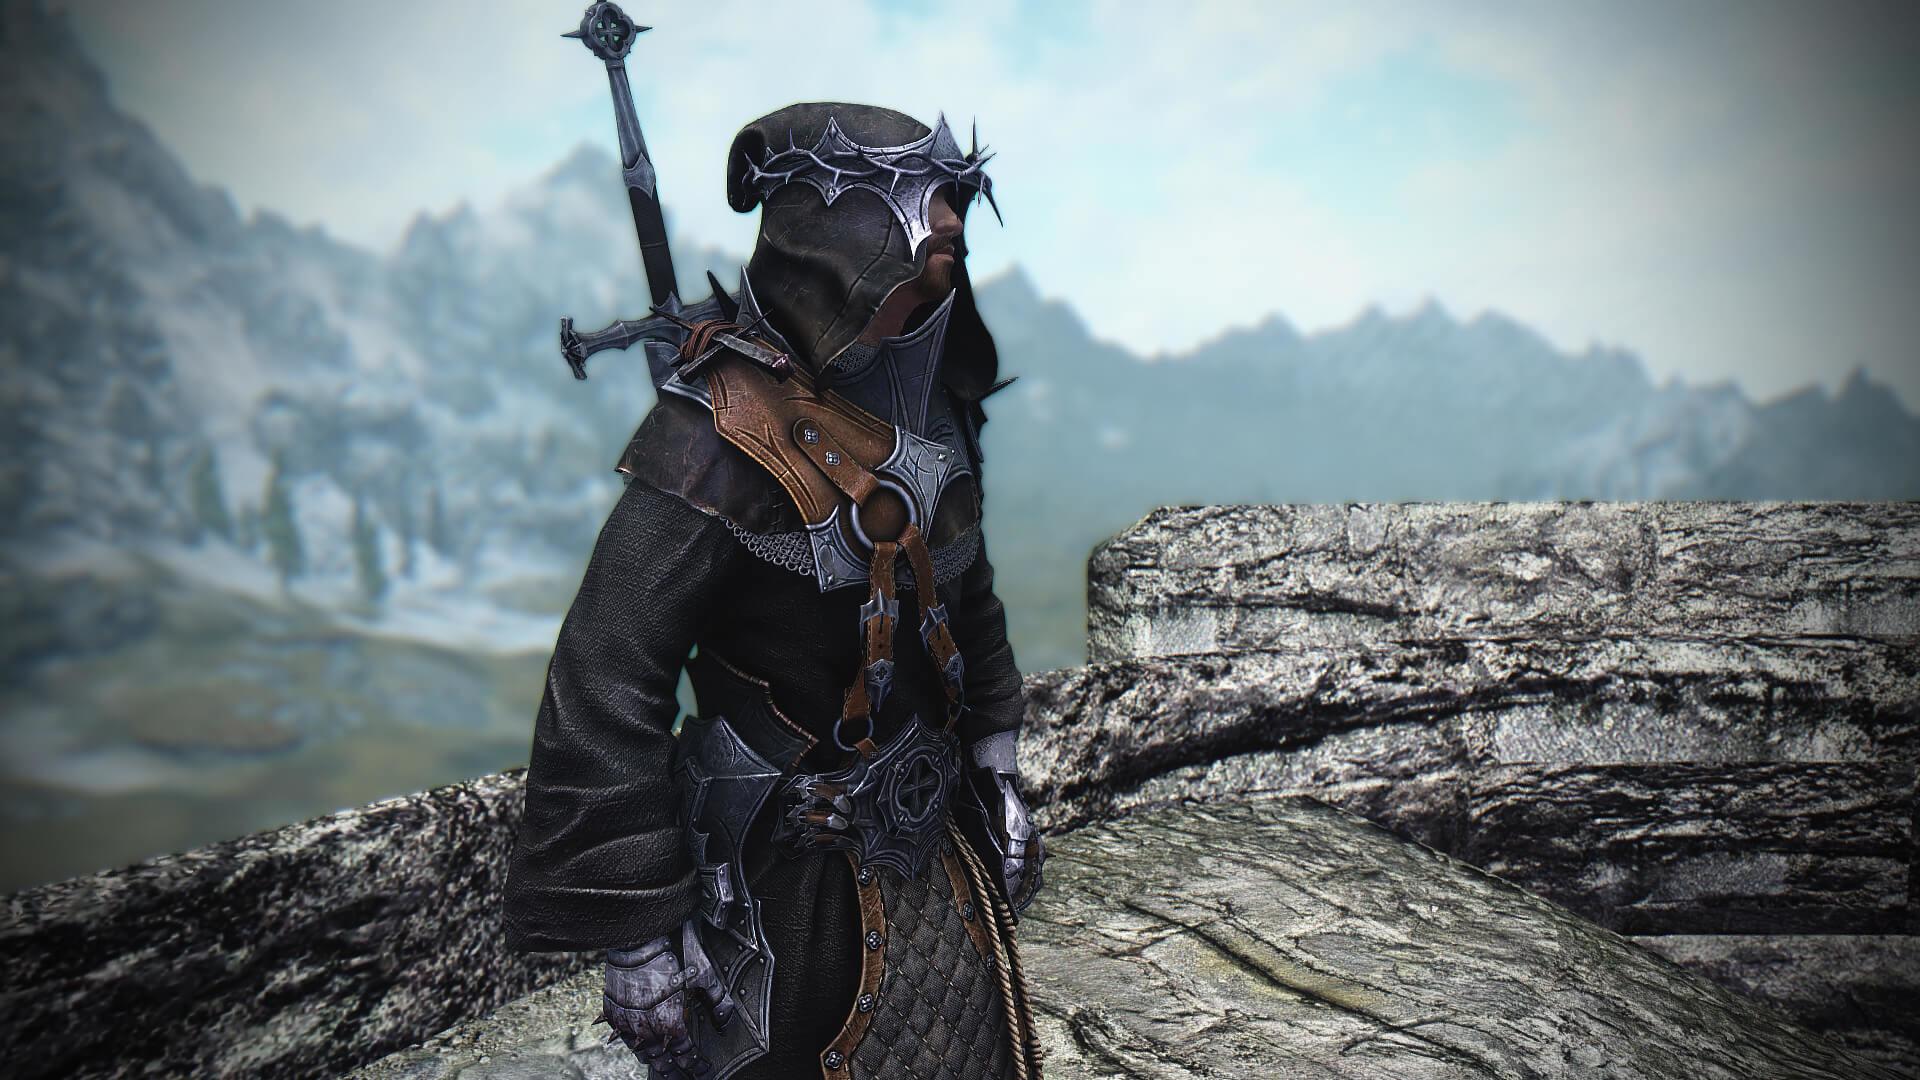 Medium armor skyrim